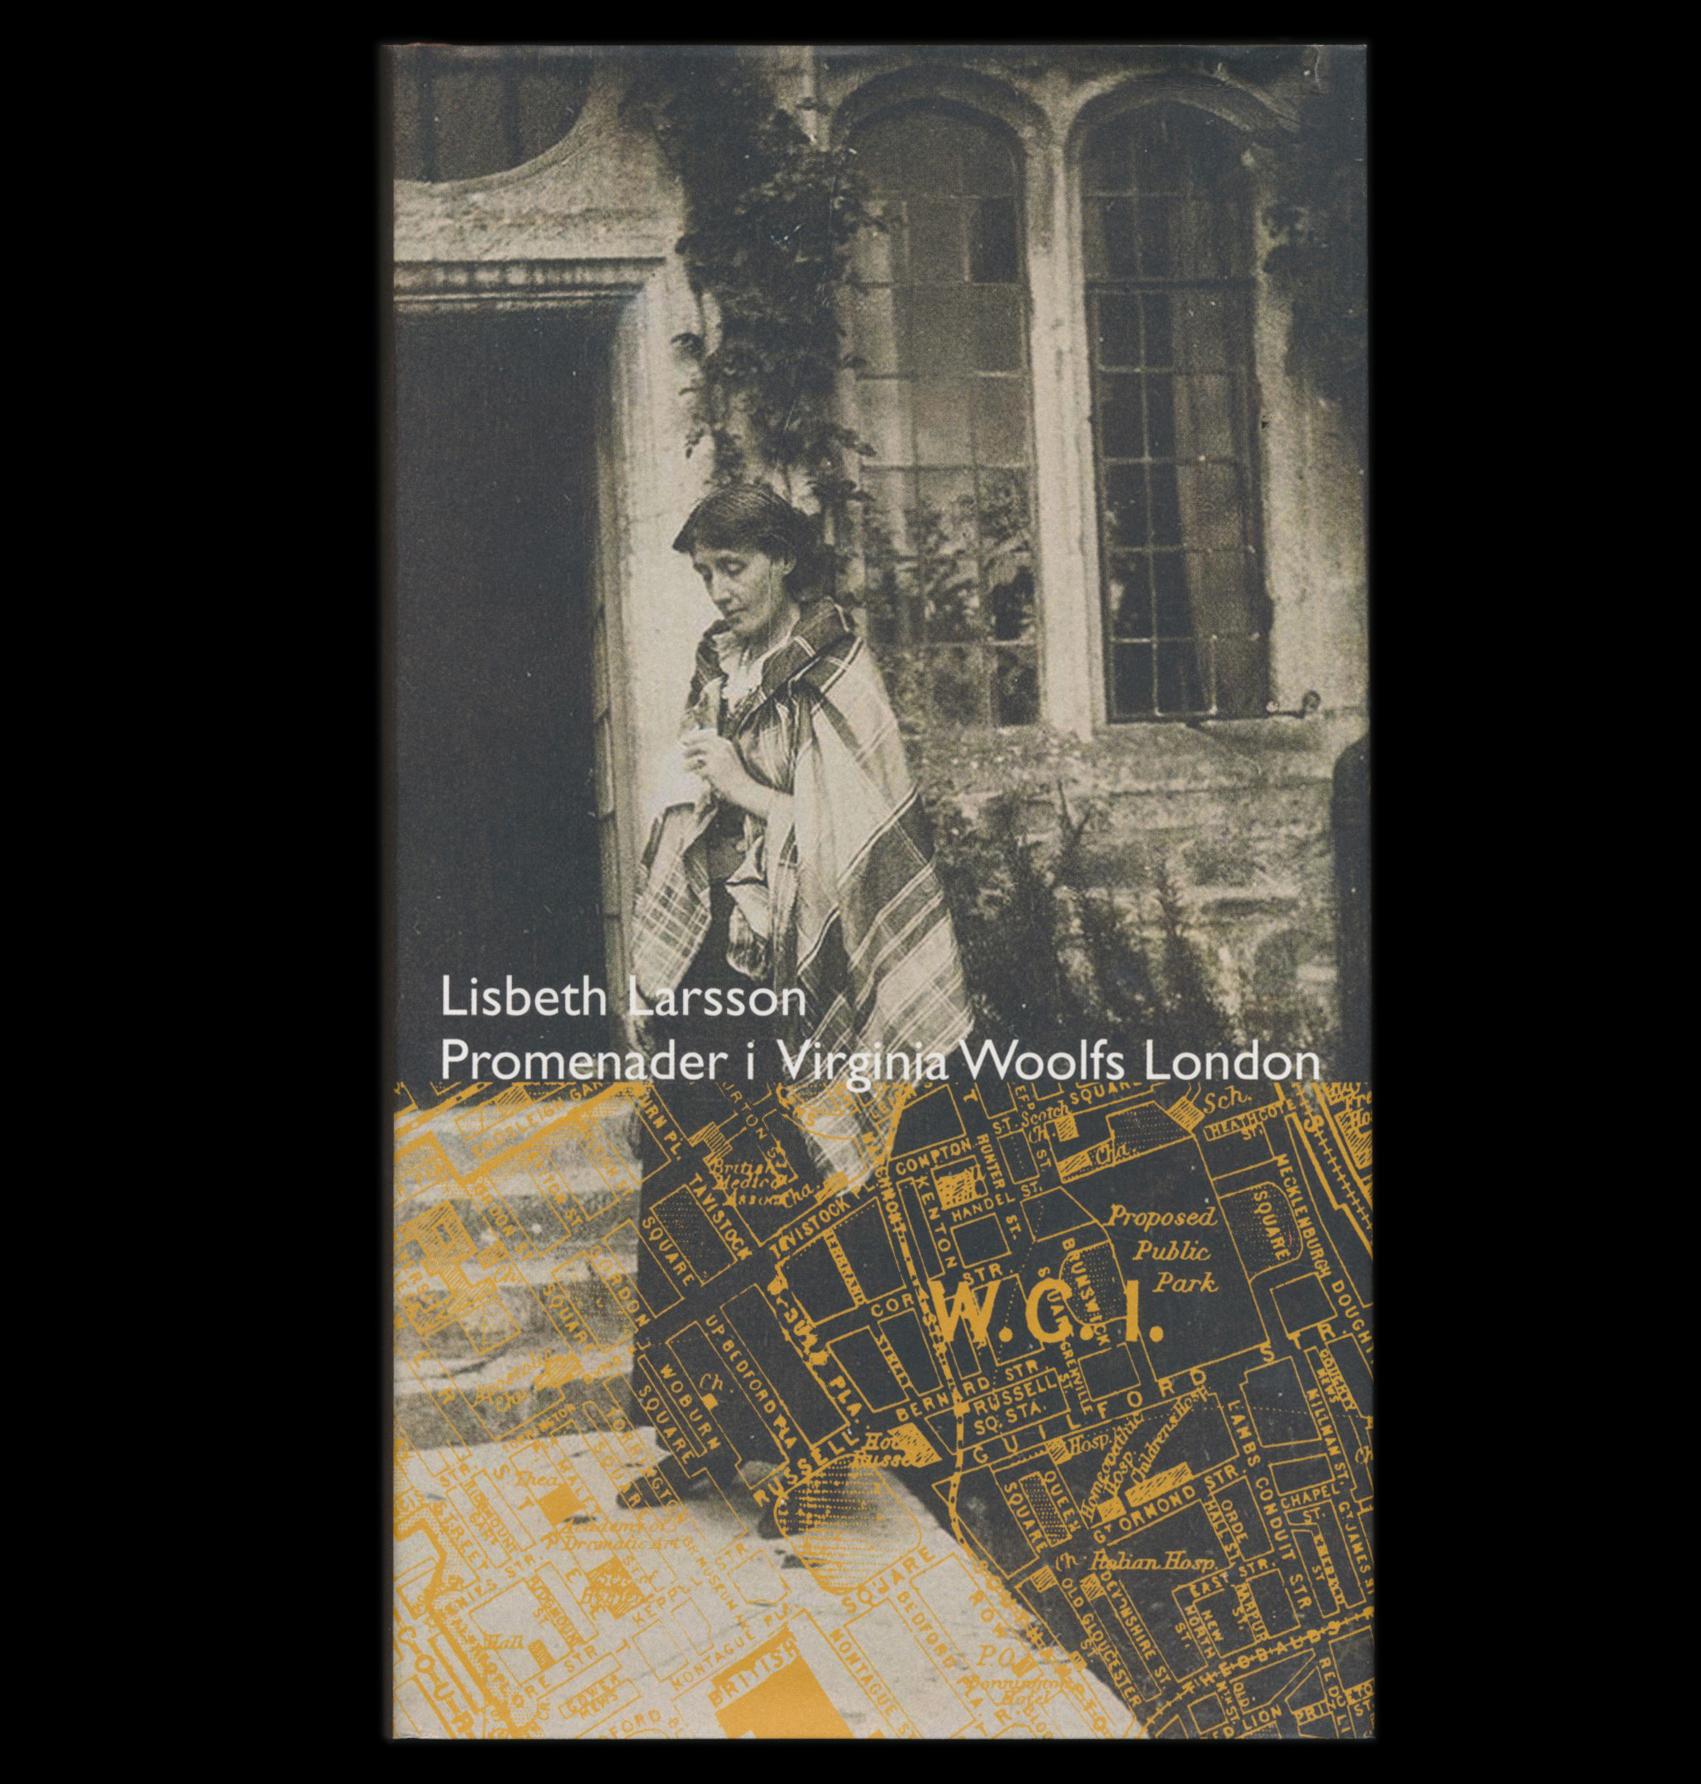 Svensk bokkonst Promenader i Virginia Woolfs London av Lisbeth Larsson